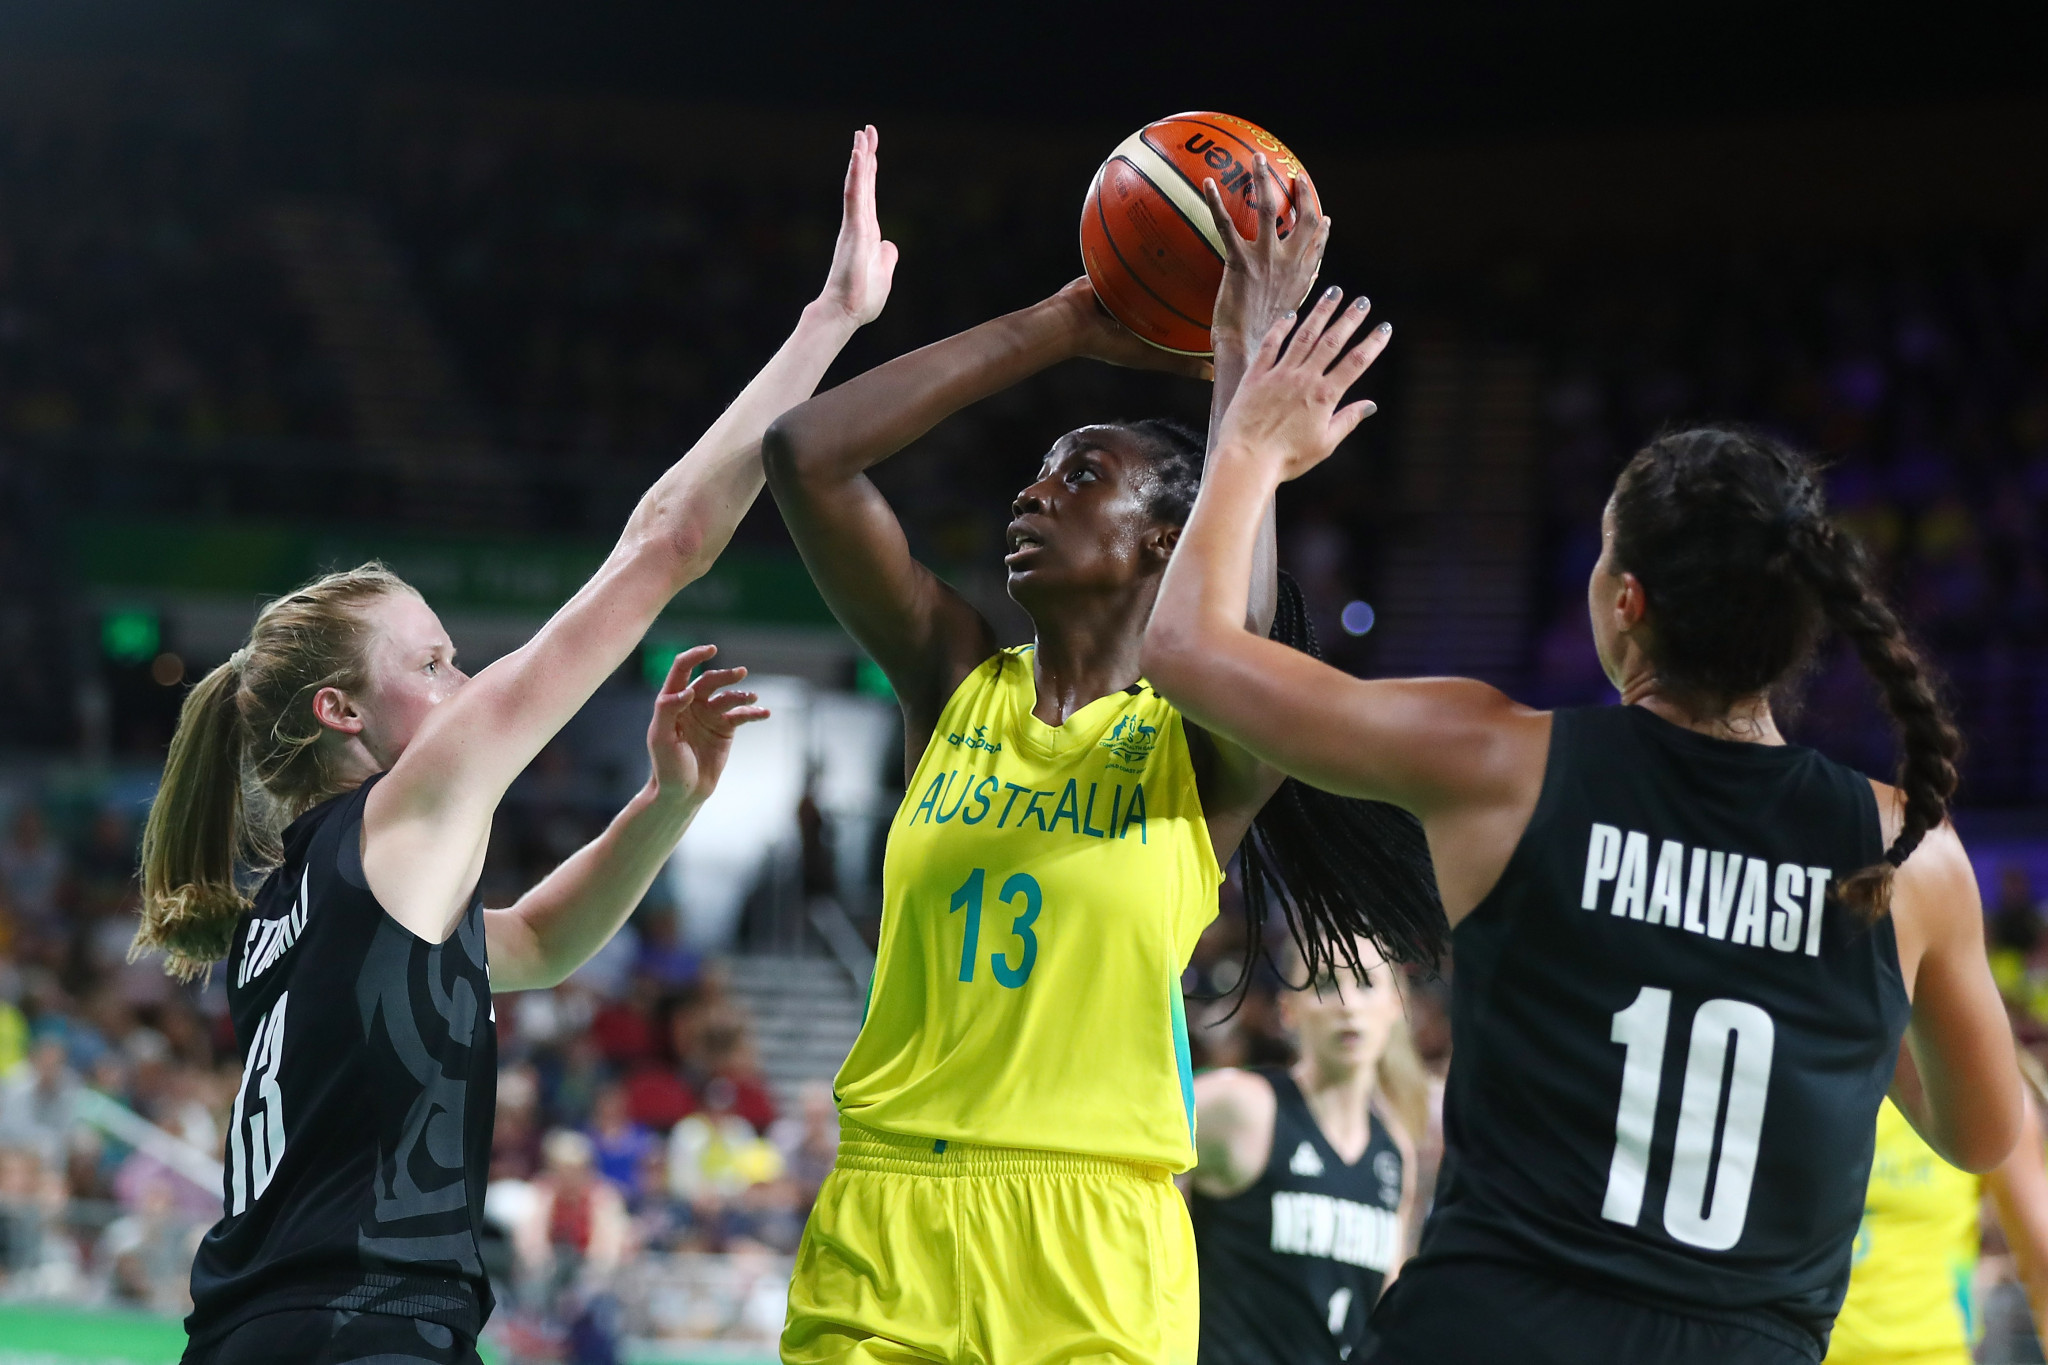 University Basketball League plans announced by UniSport Australia